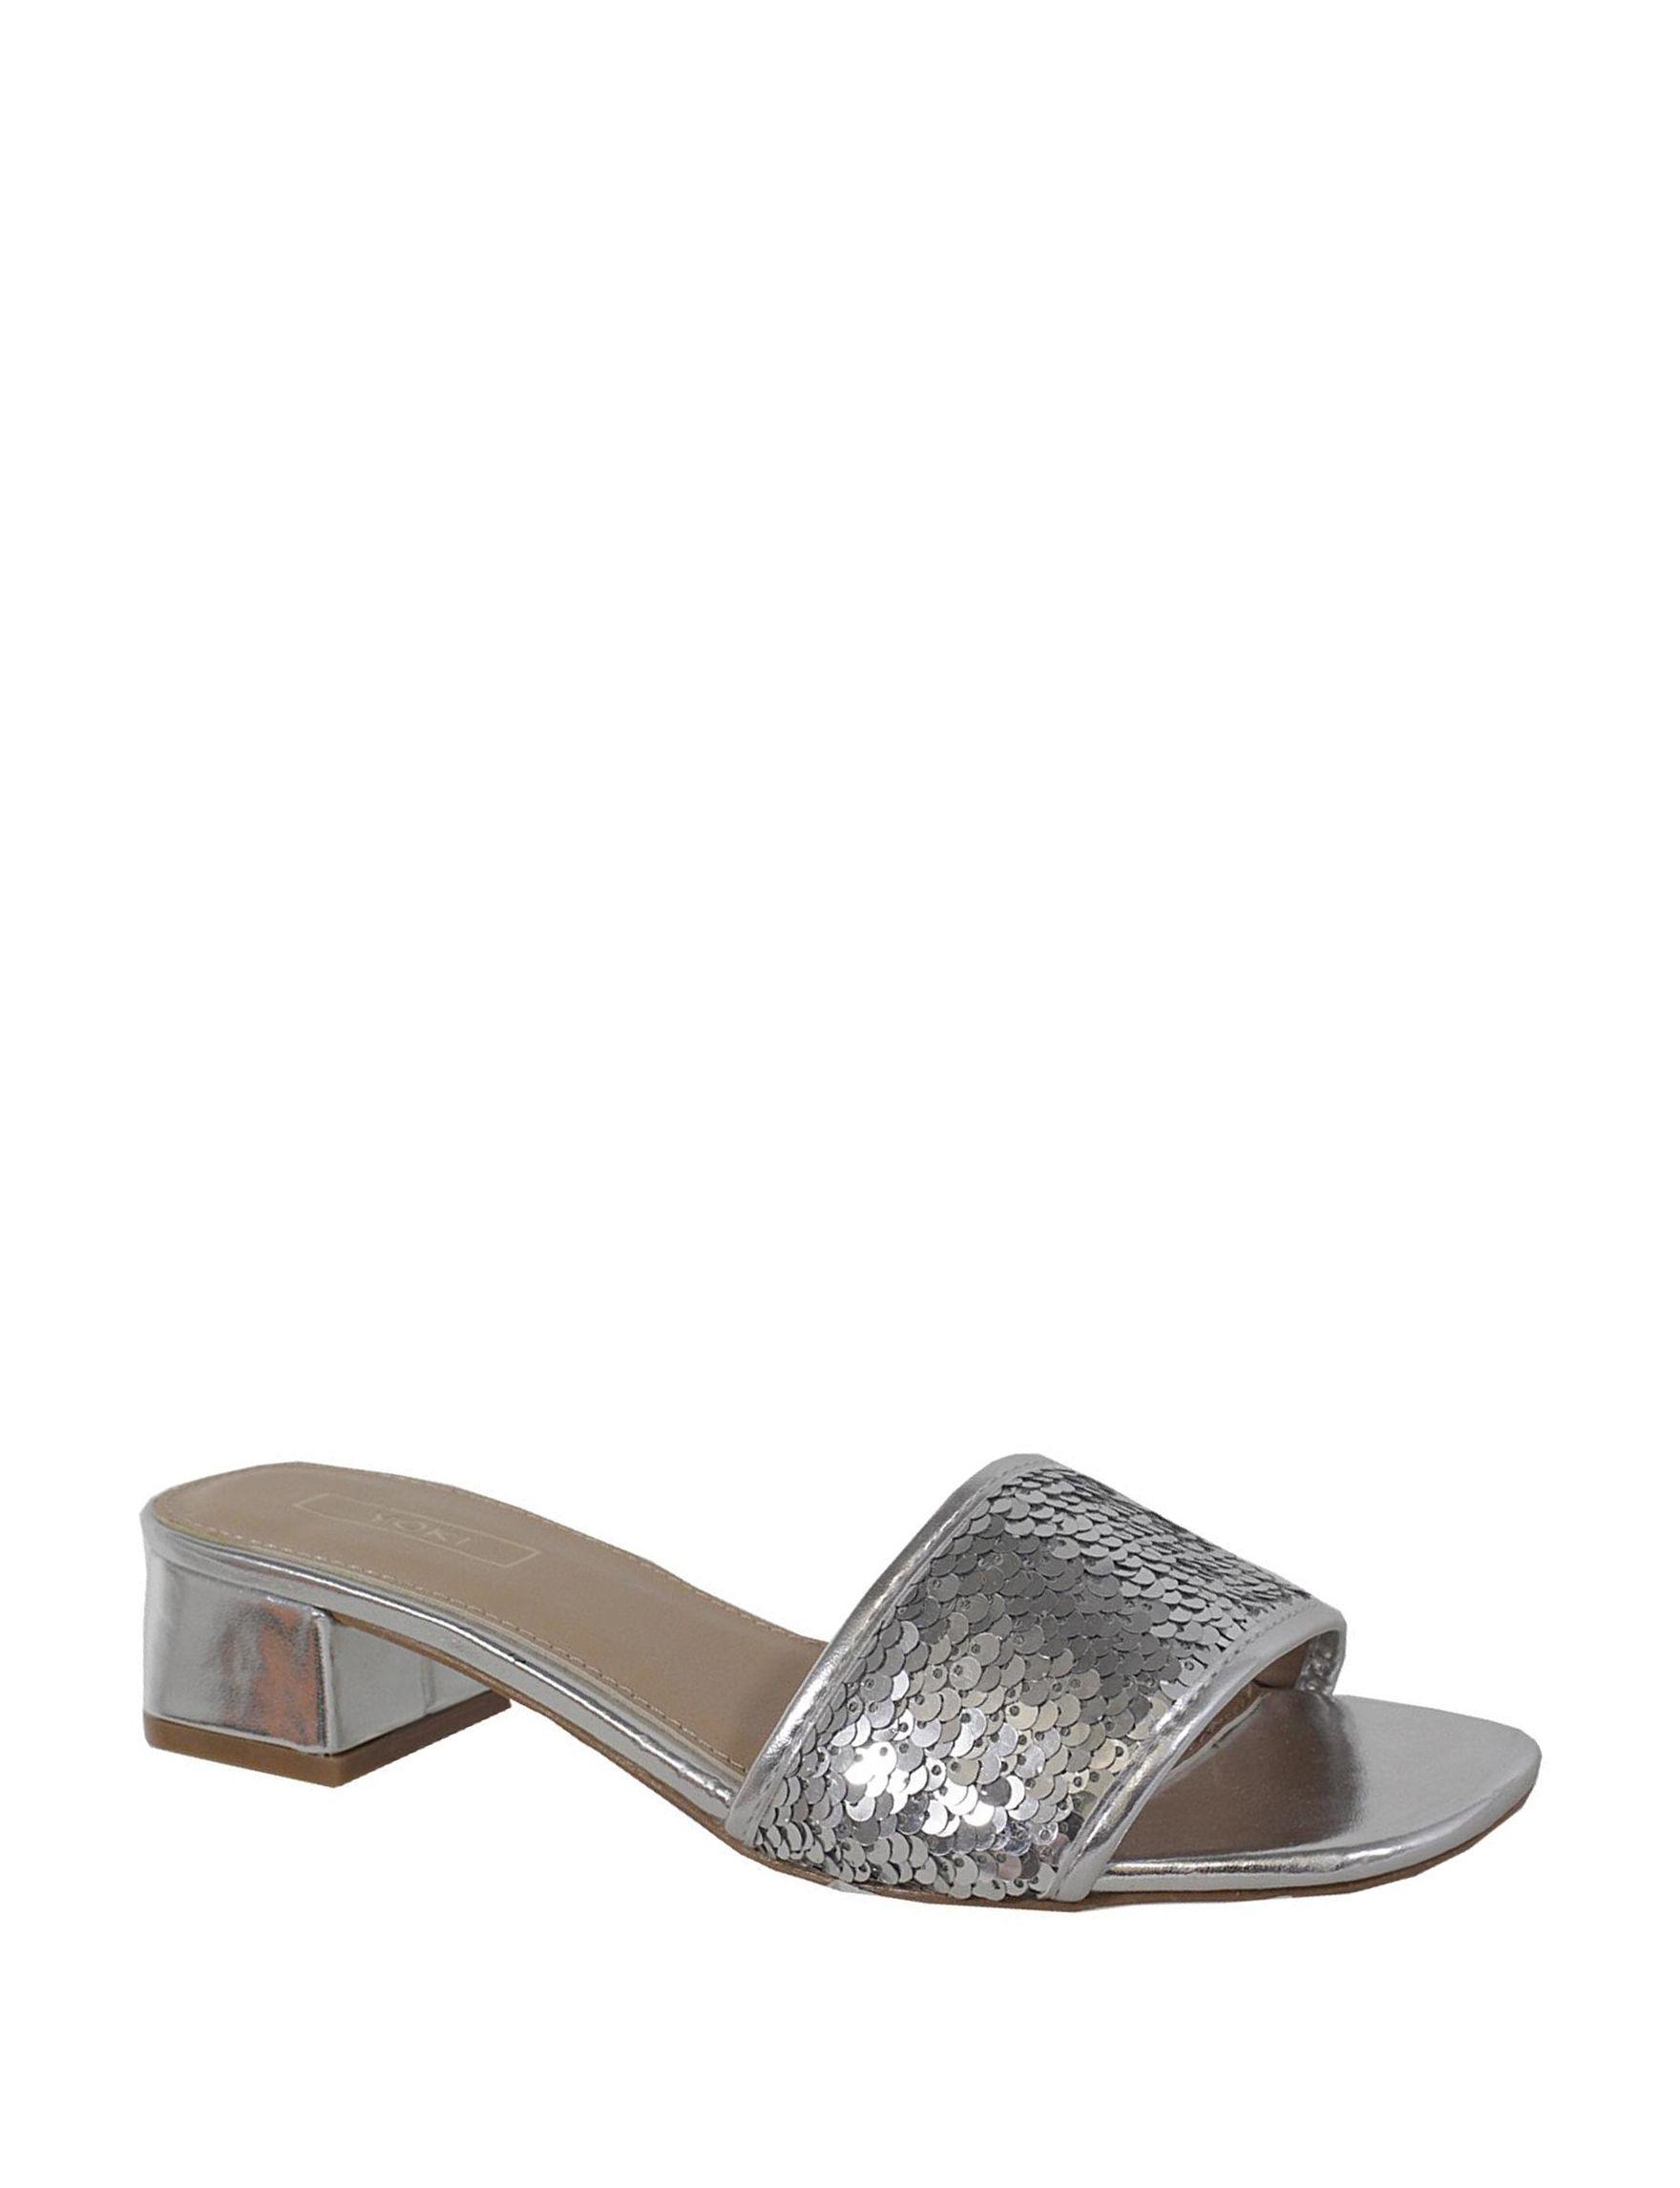 Yoki Silver Heeled Sandals